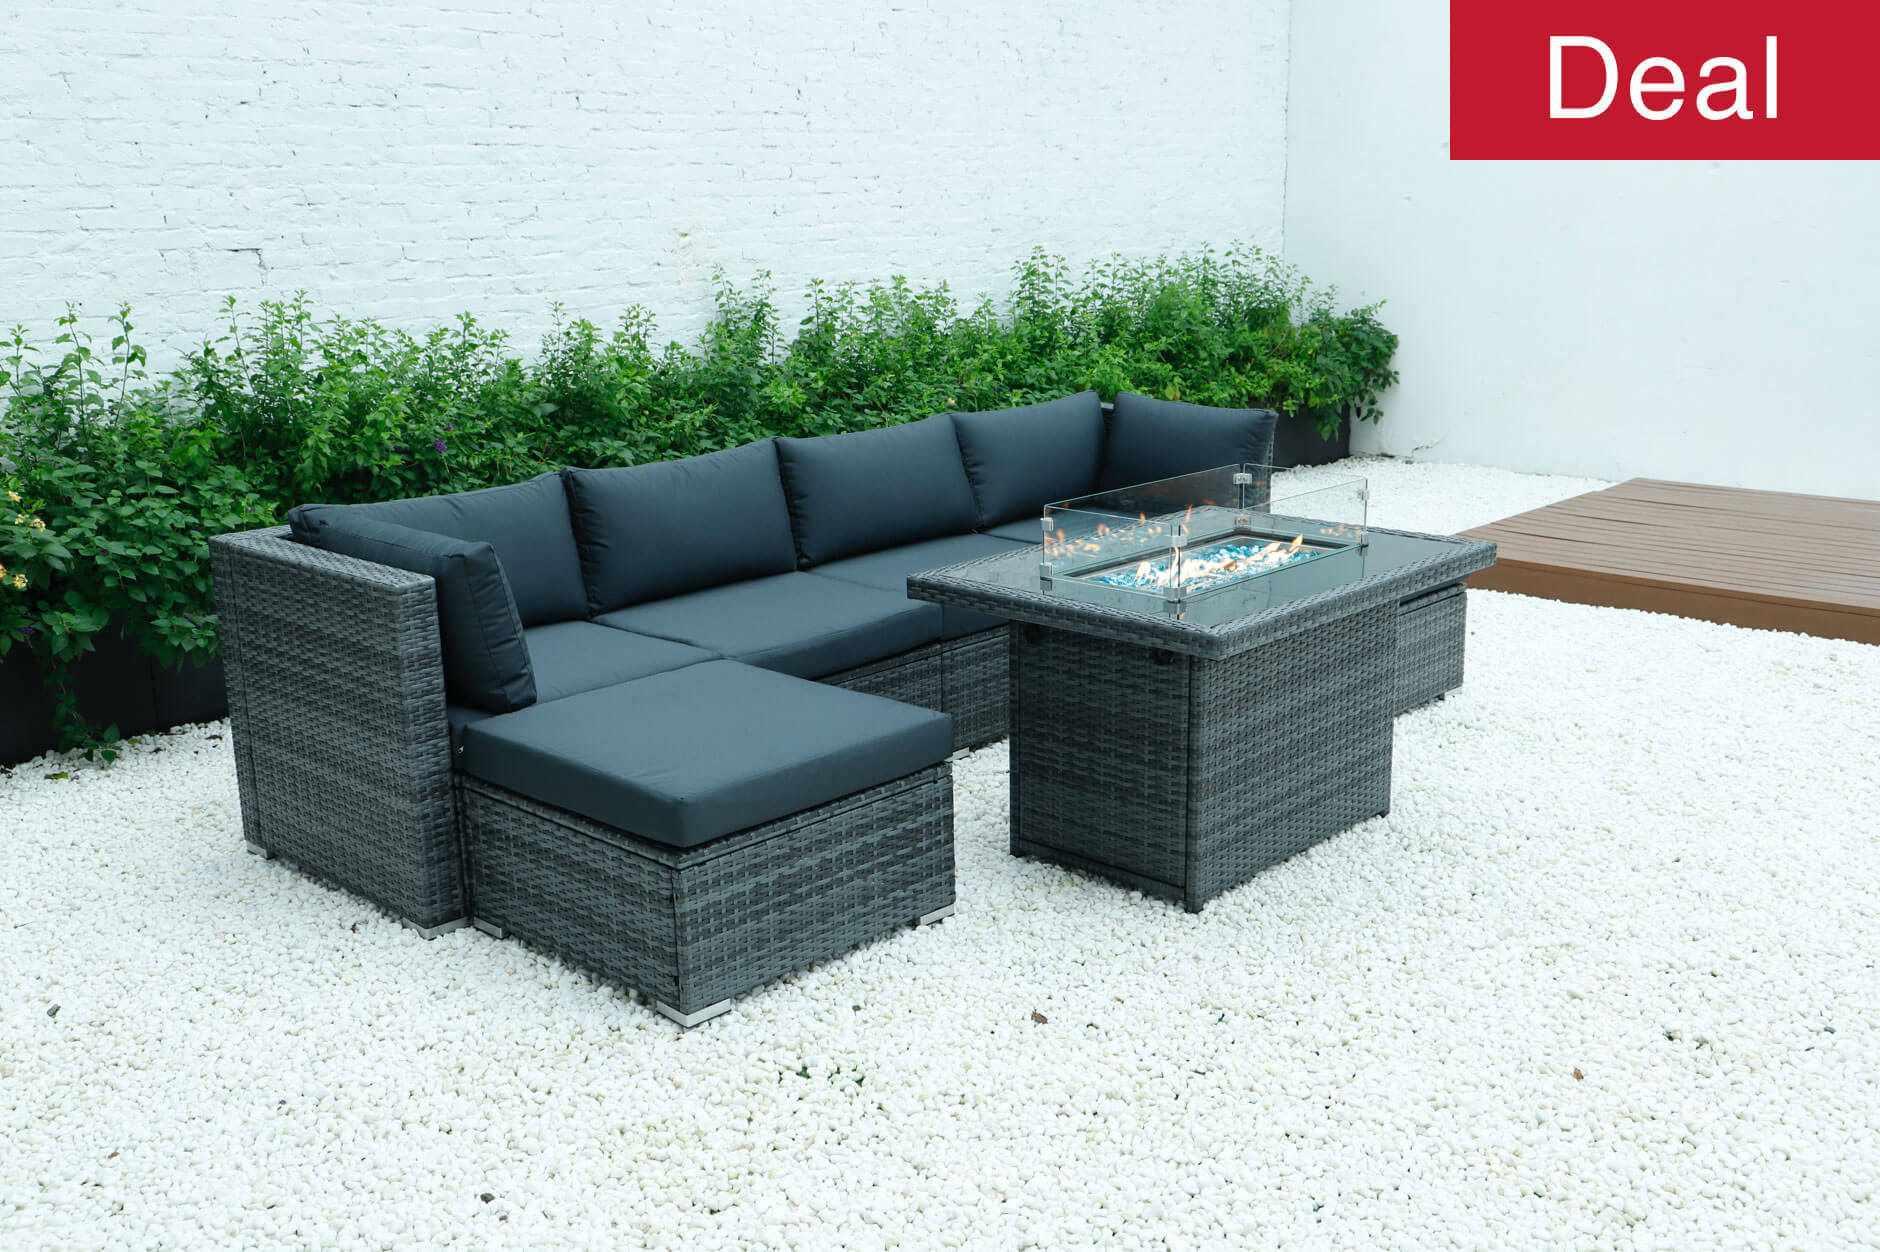 Luxor Rattan modular sofa set wicker garden furniture